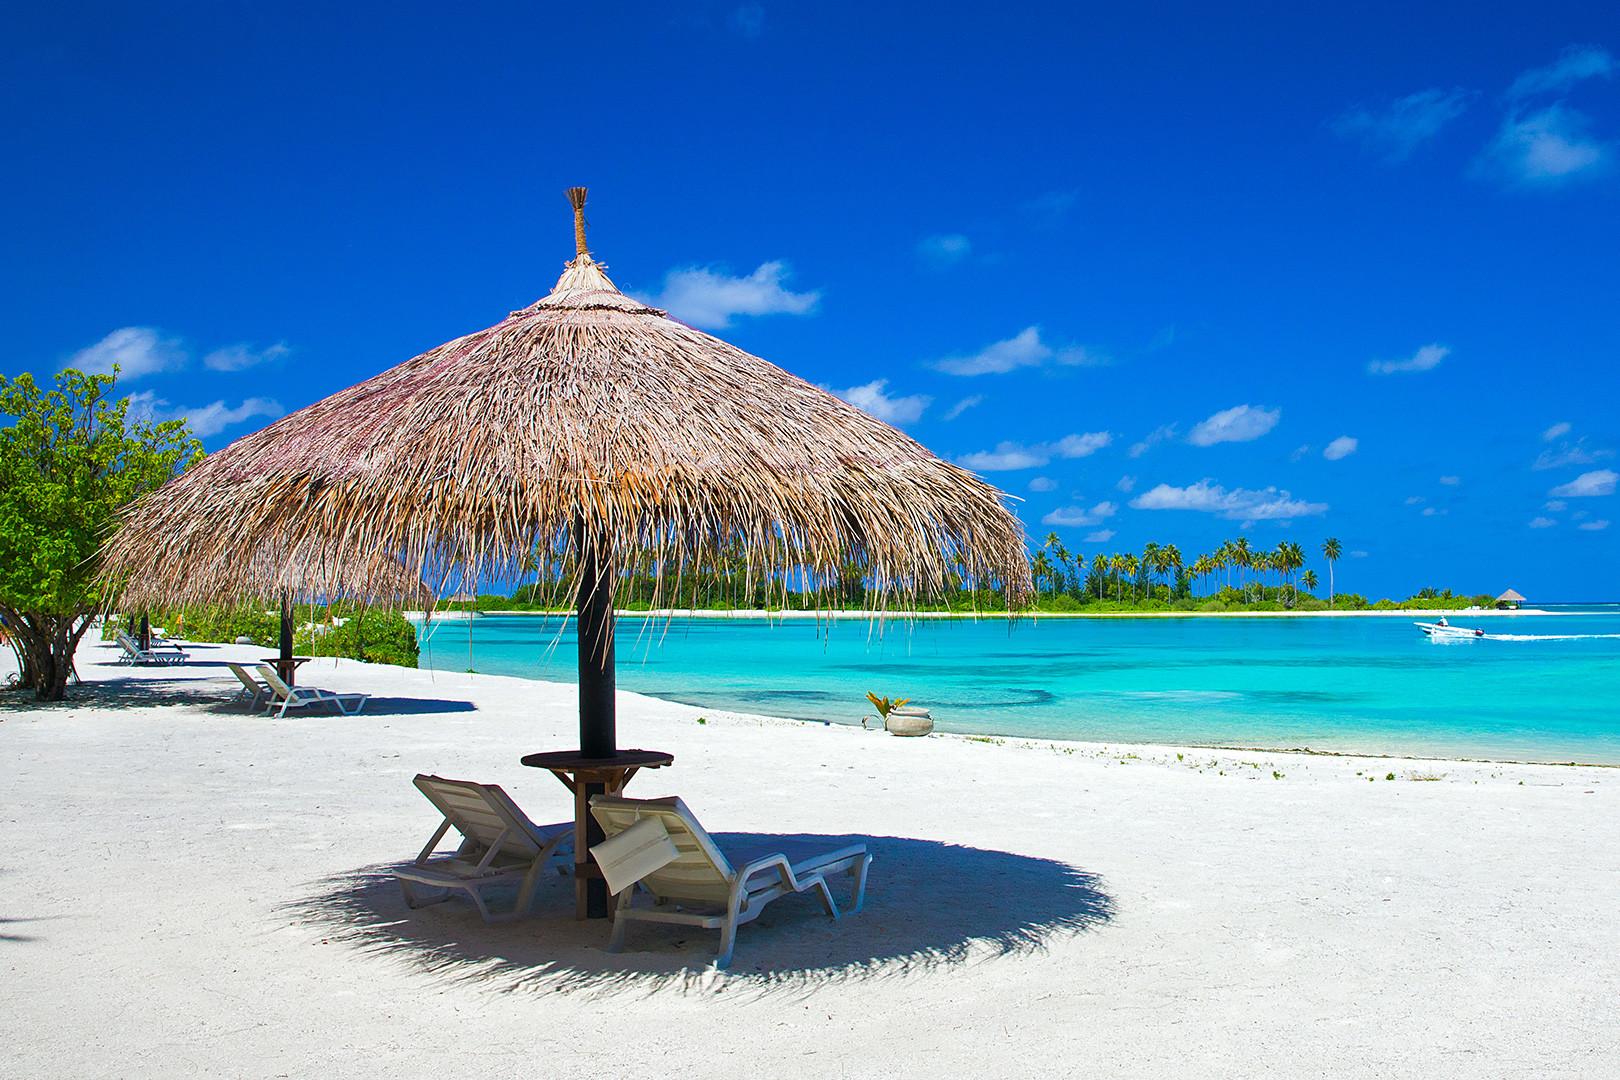 Paste 2021 - Sejur charter Maldive, 8 zile - plecare Timisoara